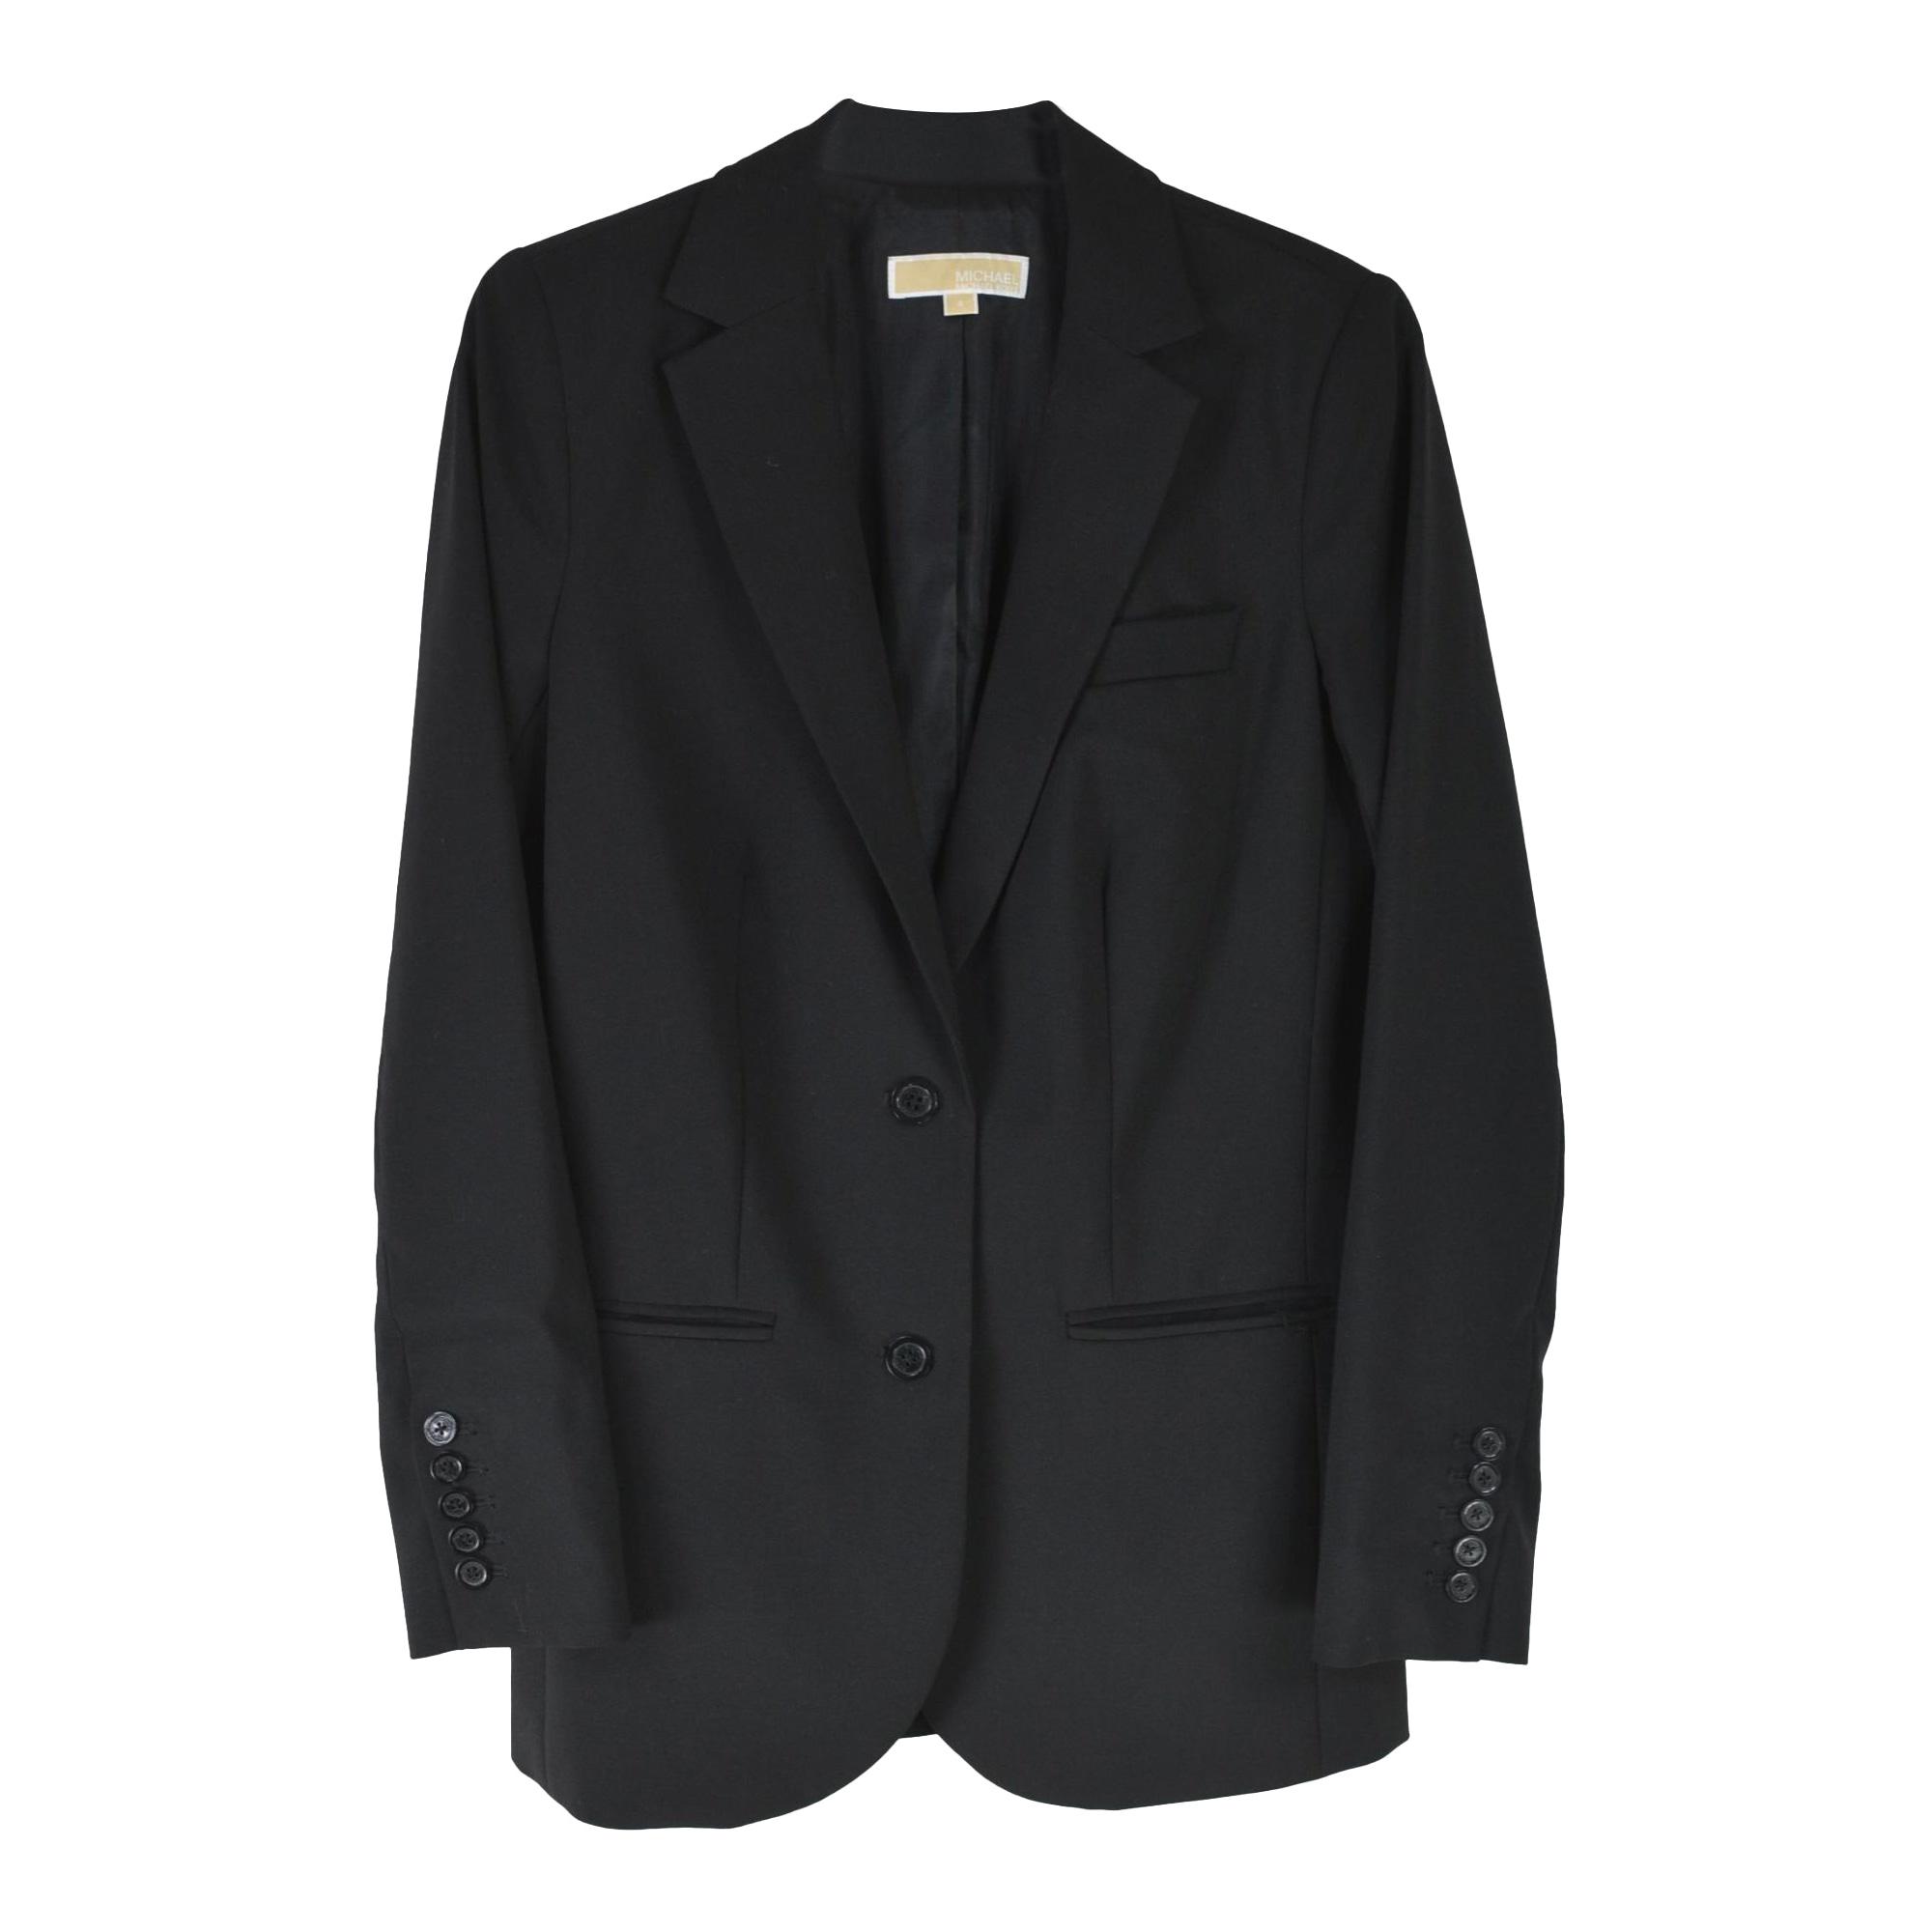 Blazer, veste tailleur MICHAEL KORS Noir